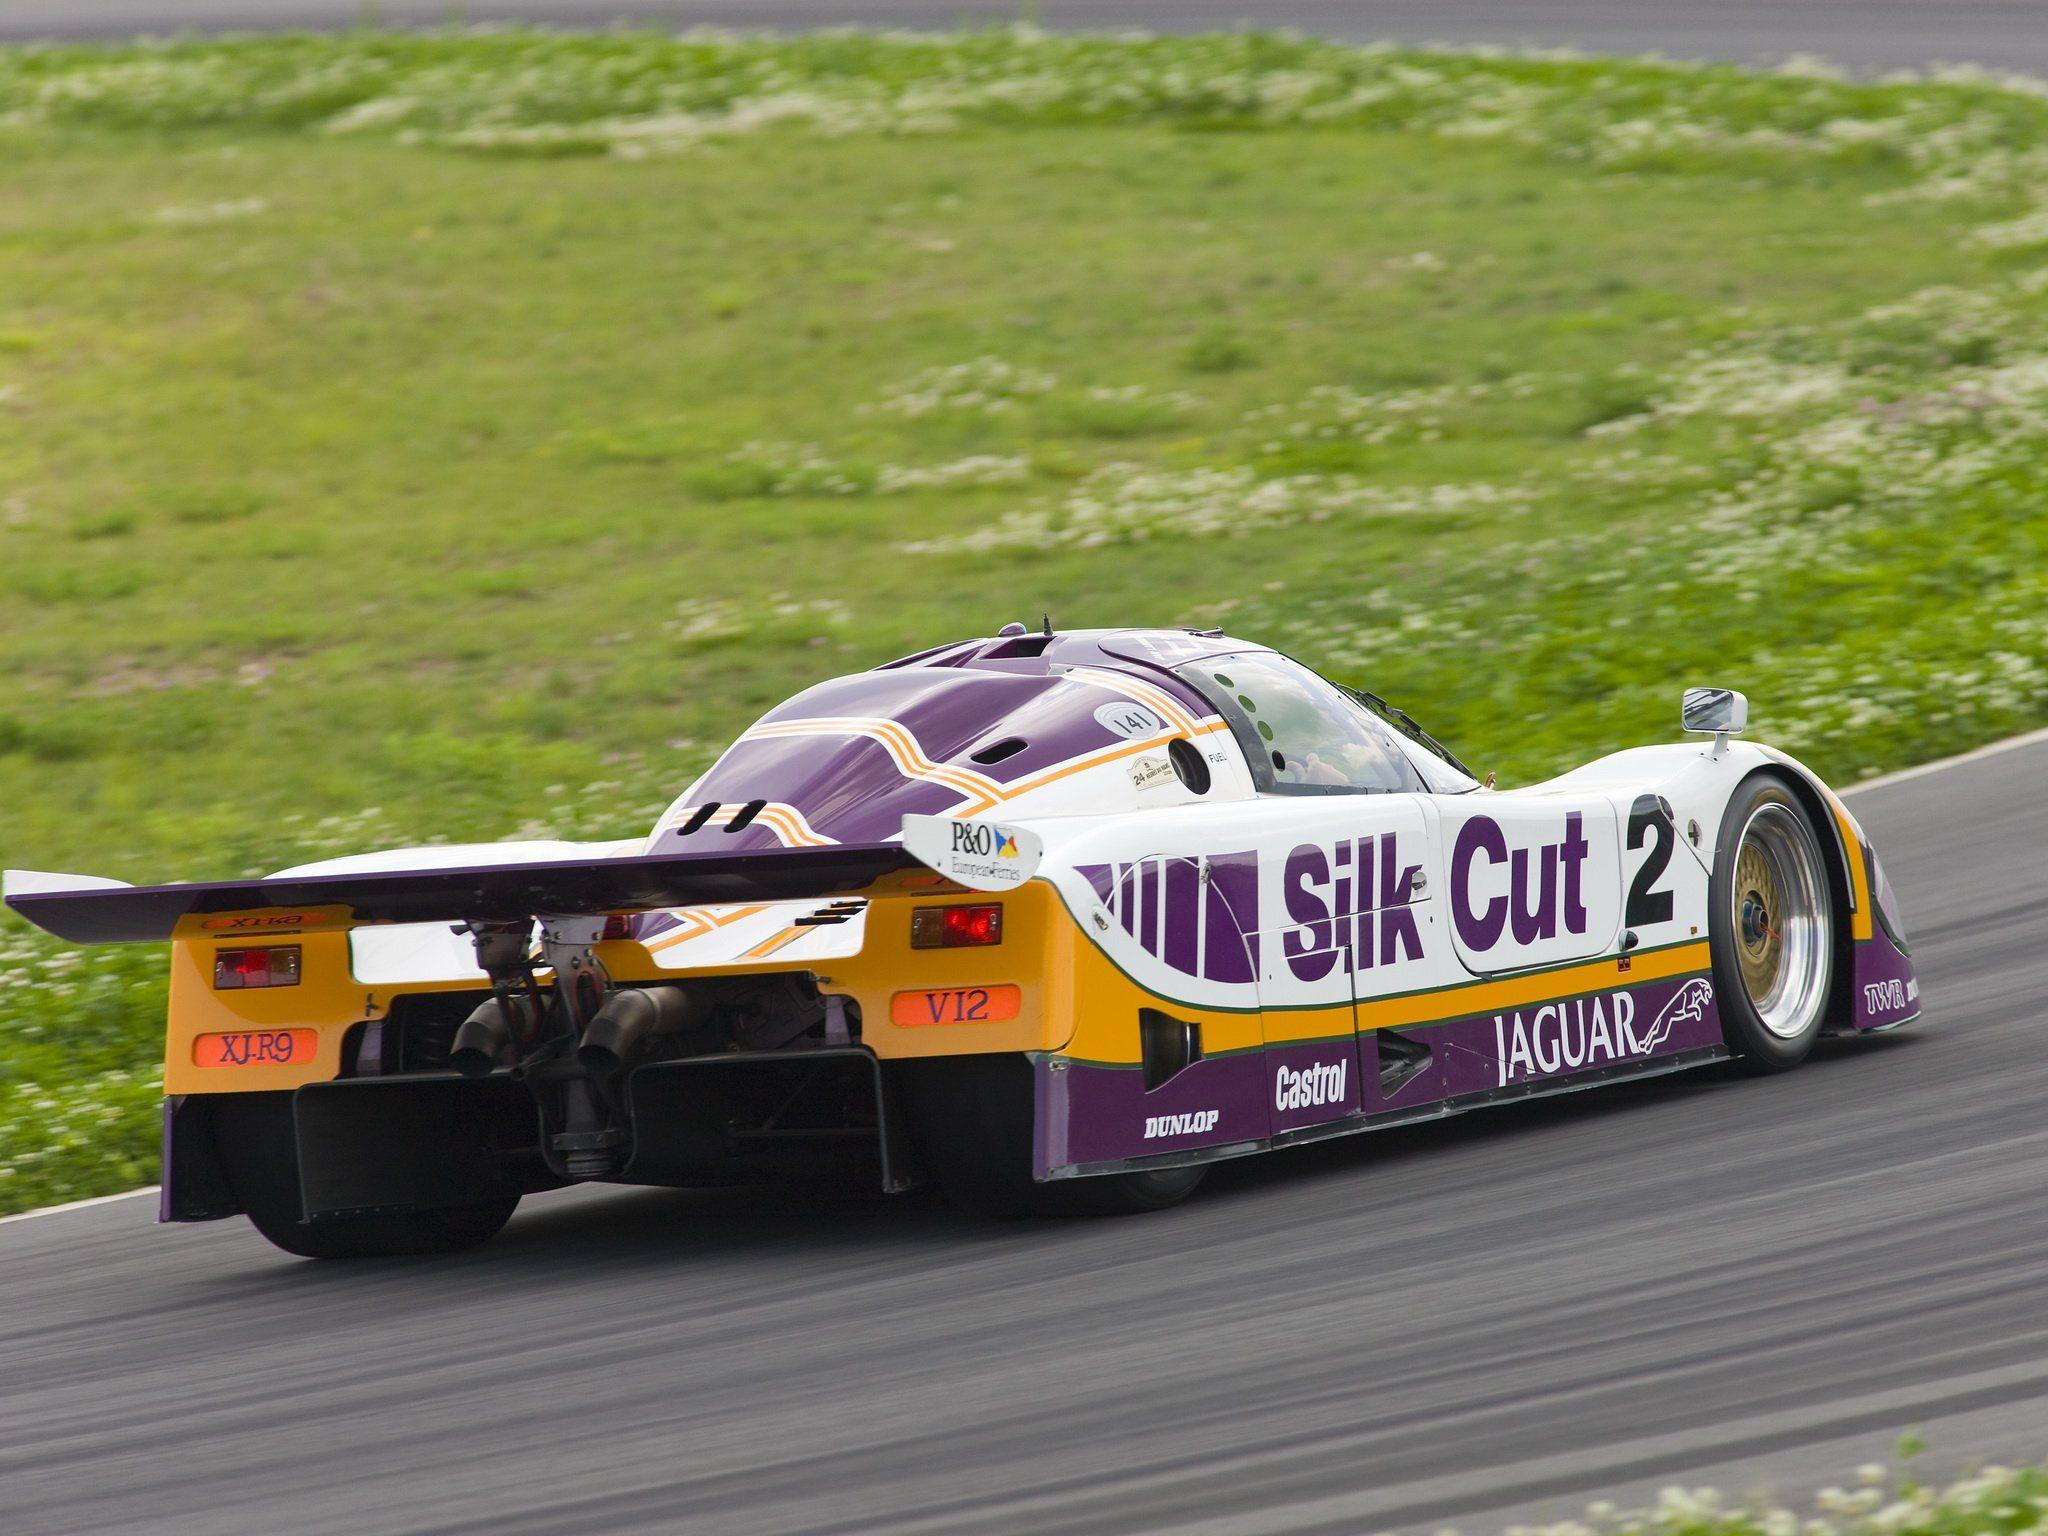 1988 Jaguar Xjr9 Le Mans Gran Prix Race Racing Wallpaper 2048x1536 516253 Le Mans Jaguar Racing